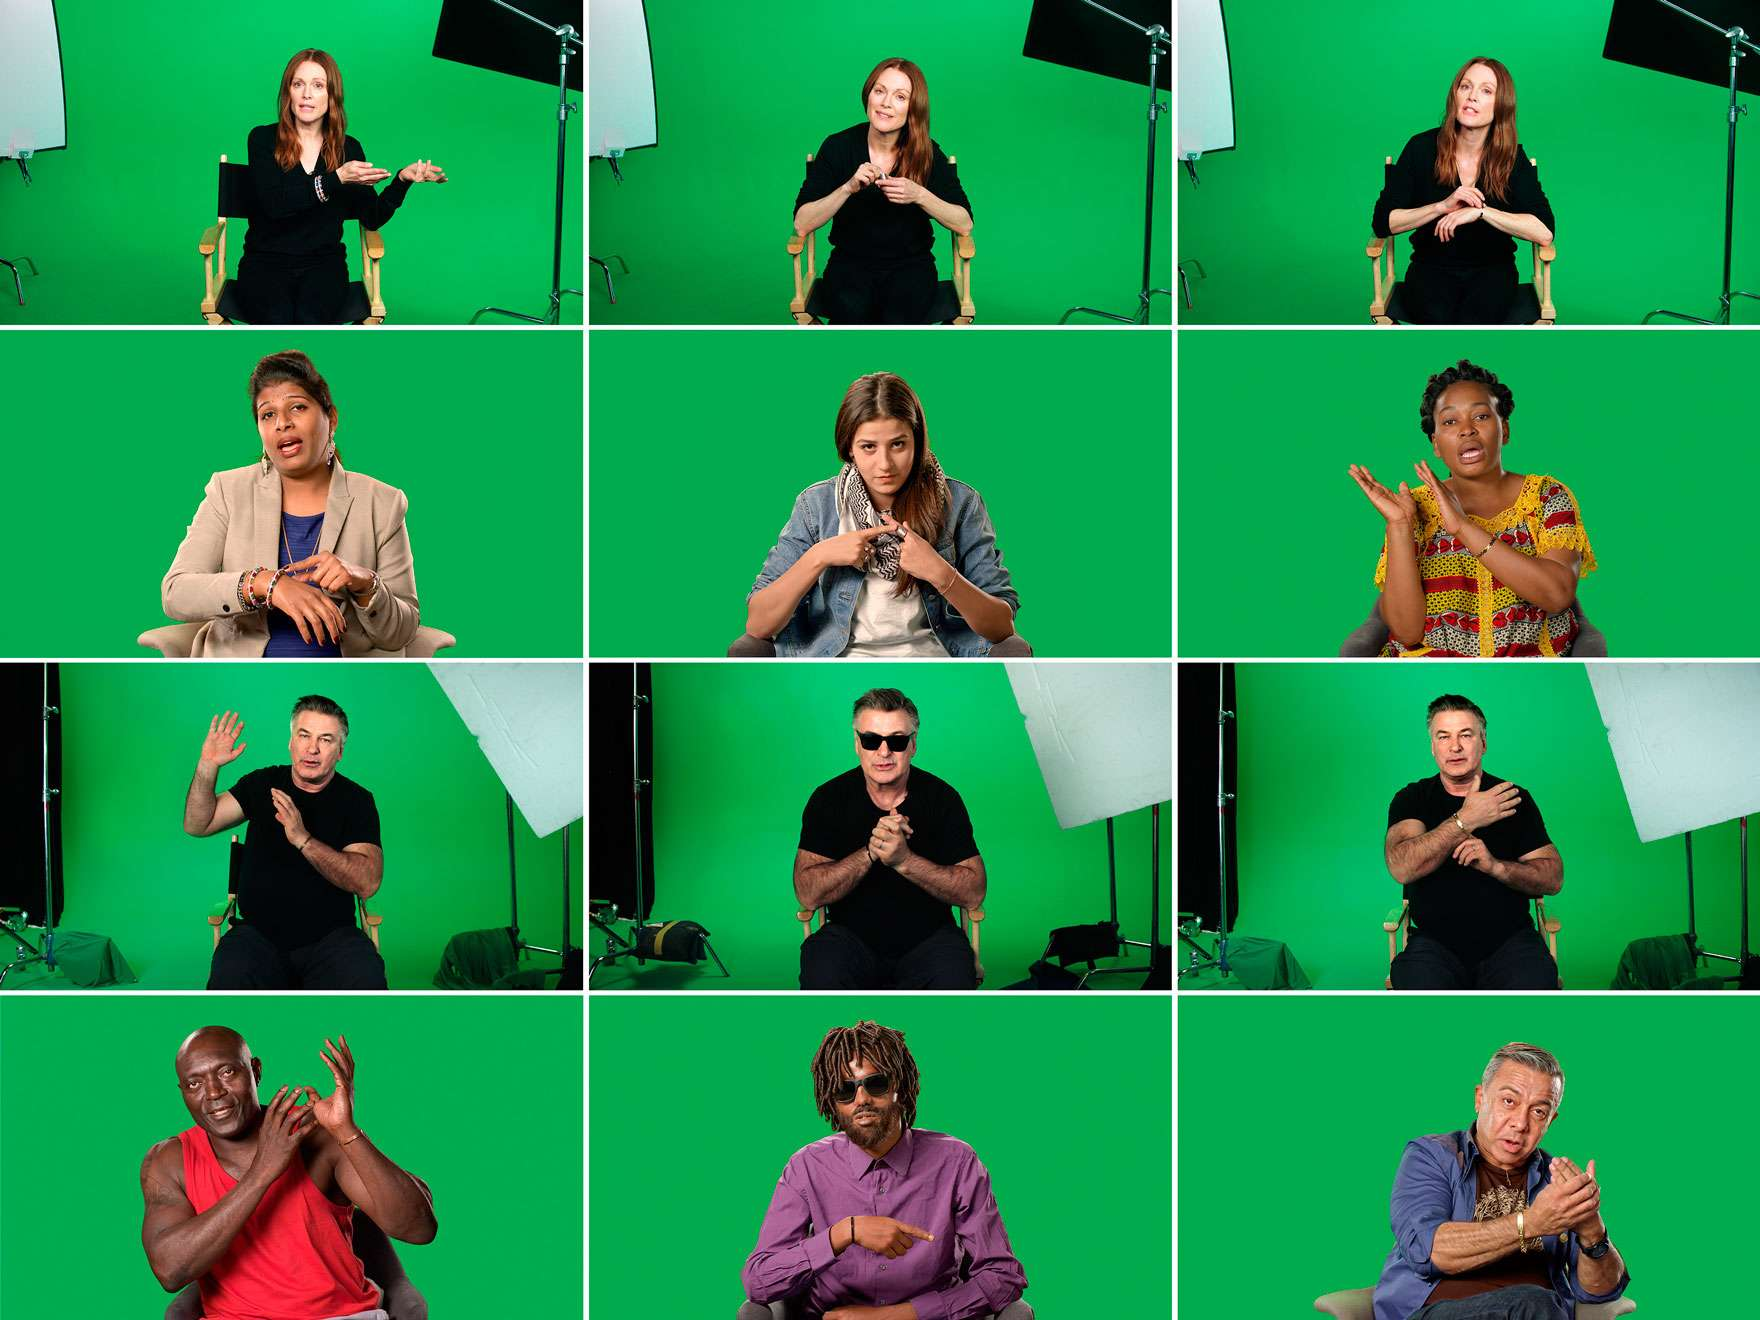 Grid of stills from Candice Breitz's video work, Love Story